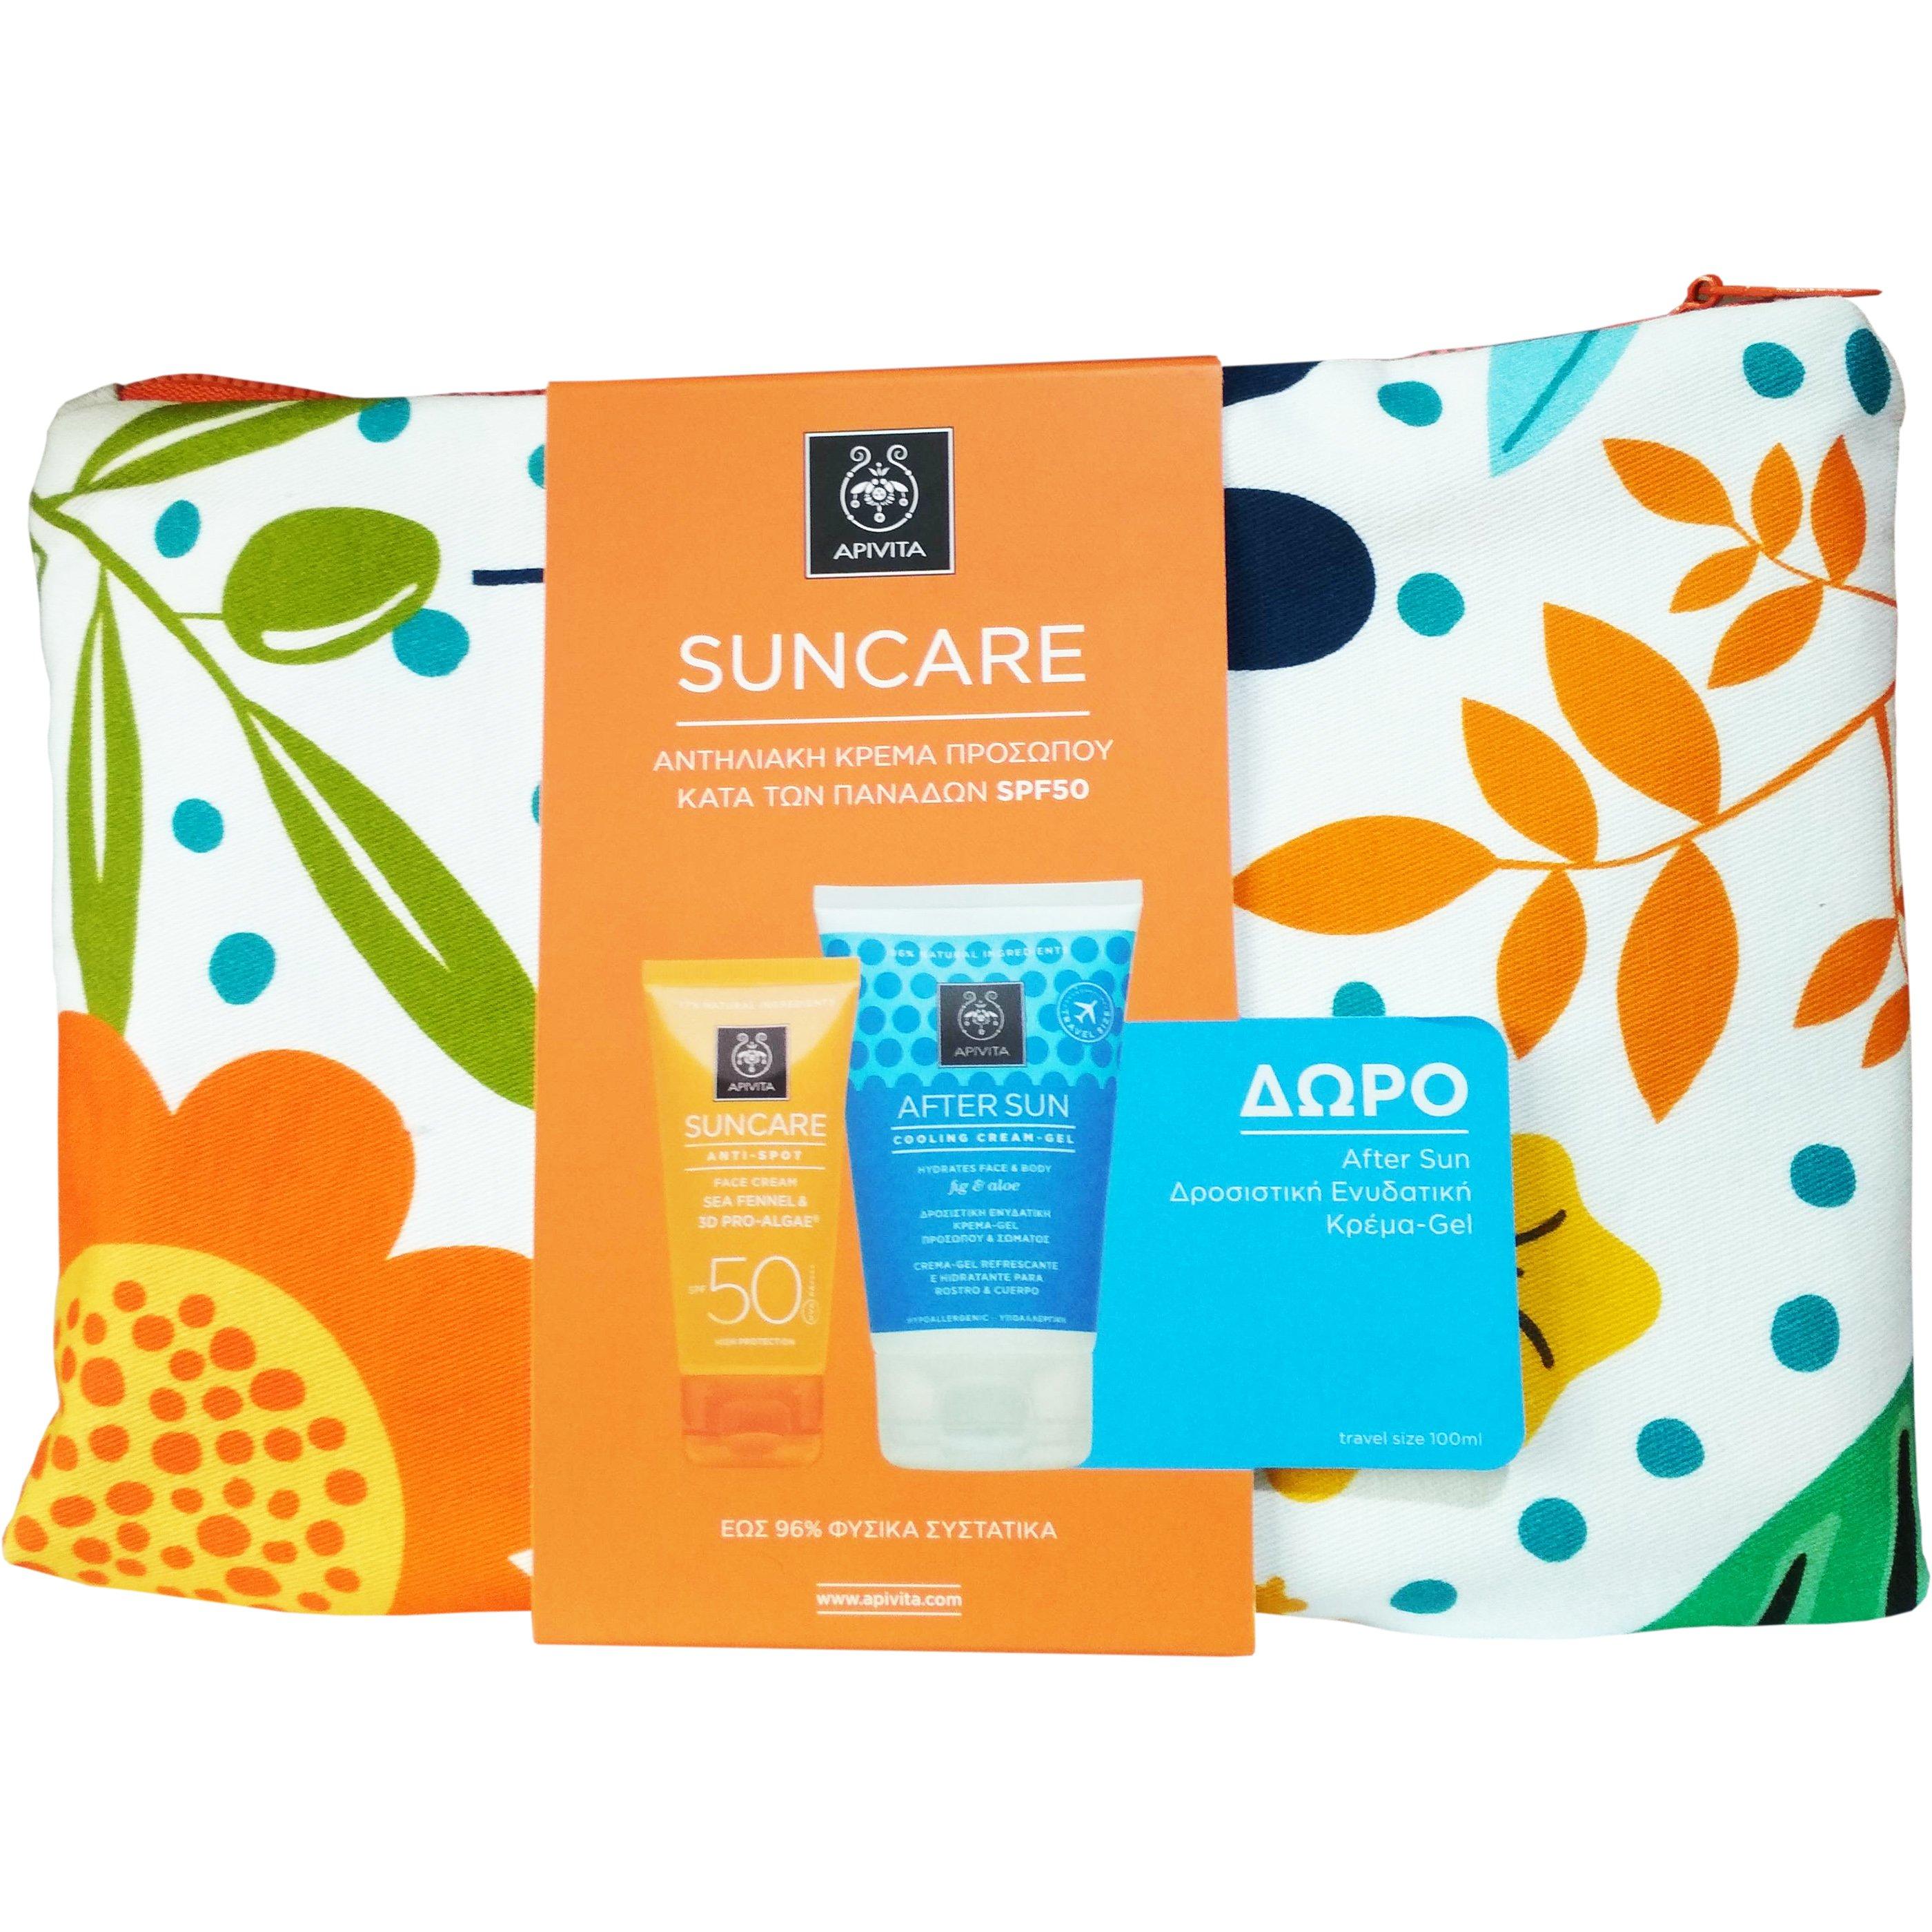 Apivita Πακέτο Προσφοράς Suncare Anti Spot Face Cream Spf50, 50ml & Δώρο After S αντηλιακά   αντηλιακά προσώπου   αντηλιακή προστασία κατά των πανάδων